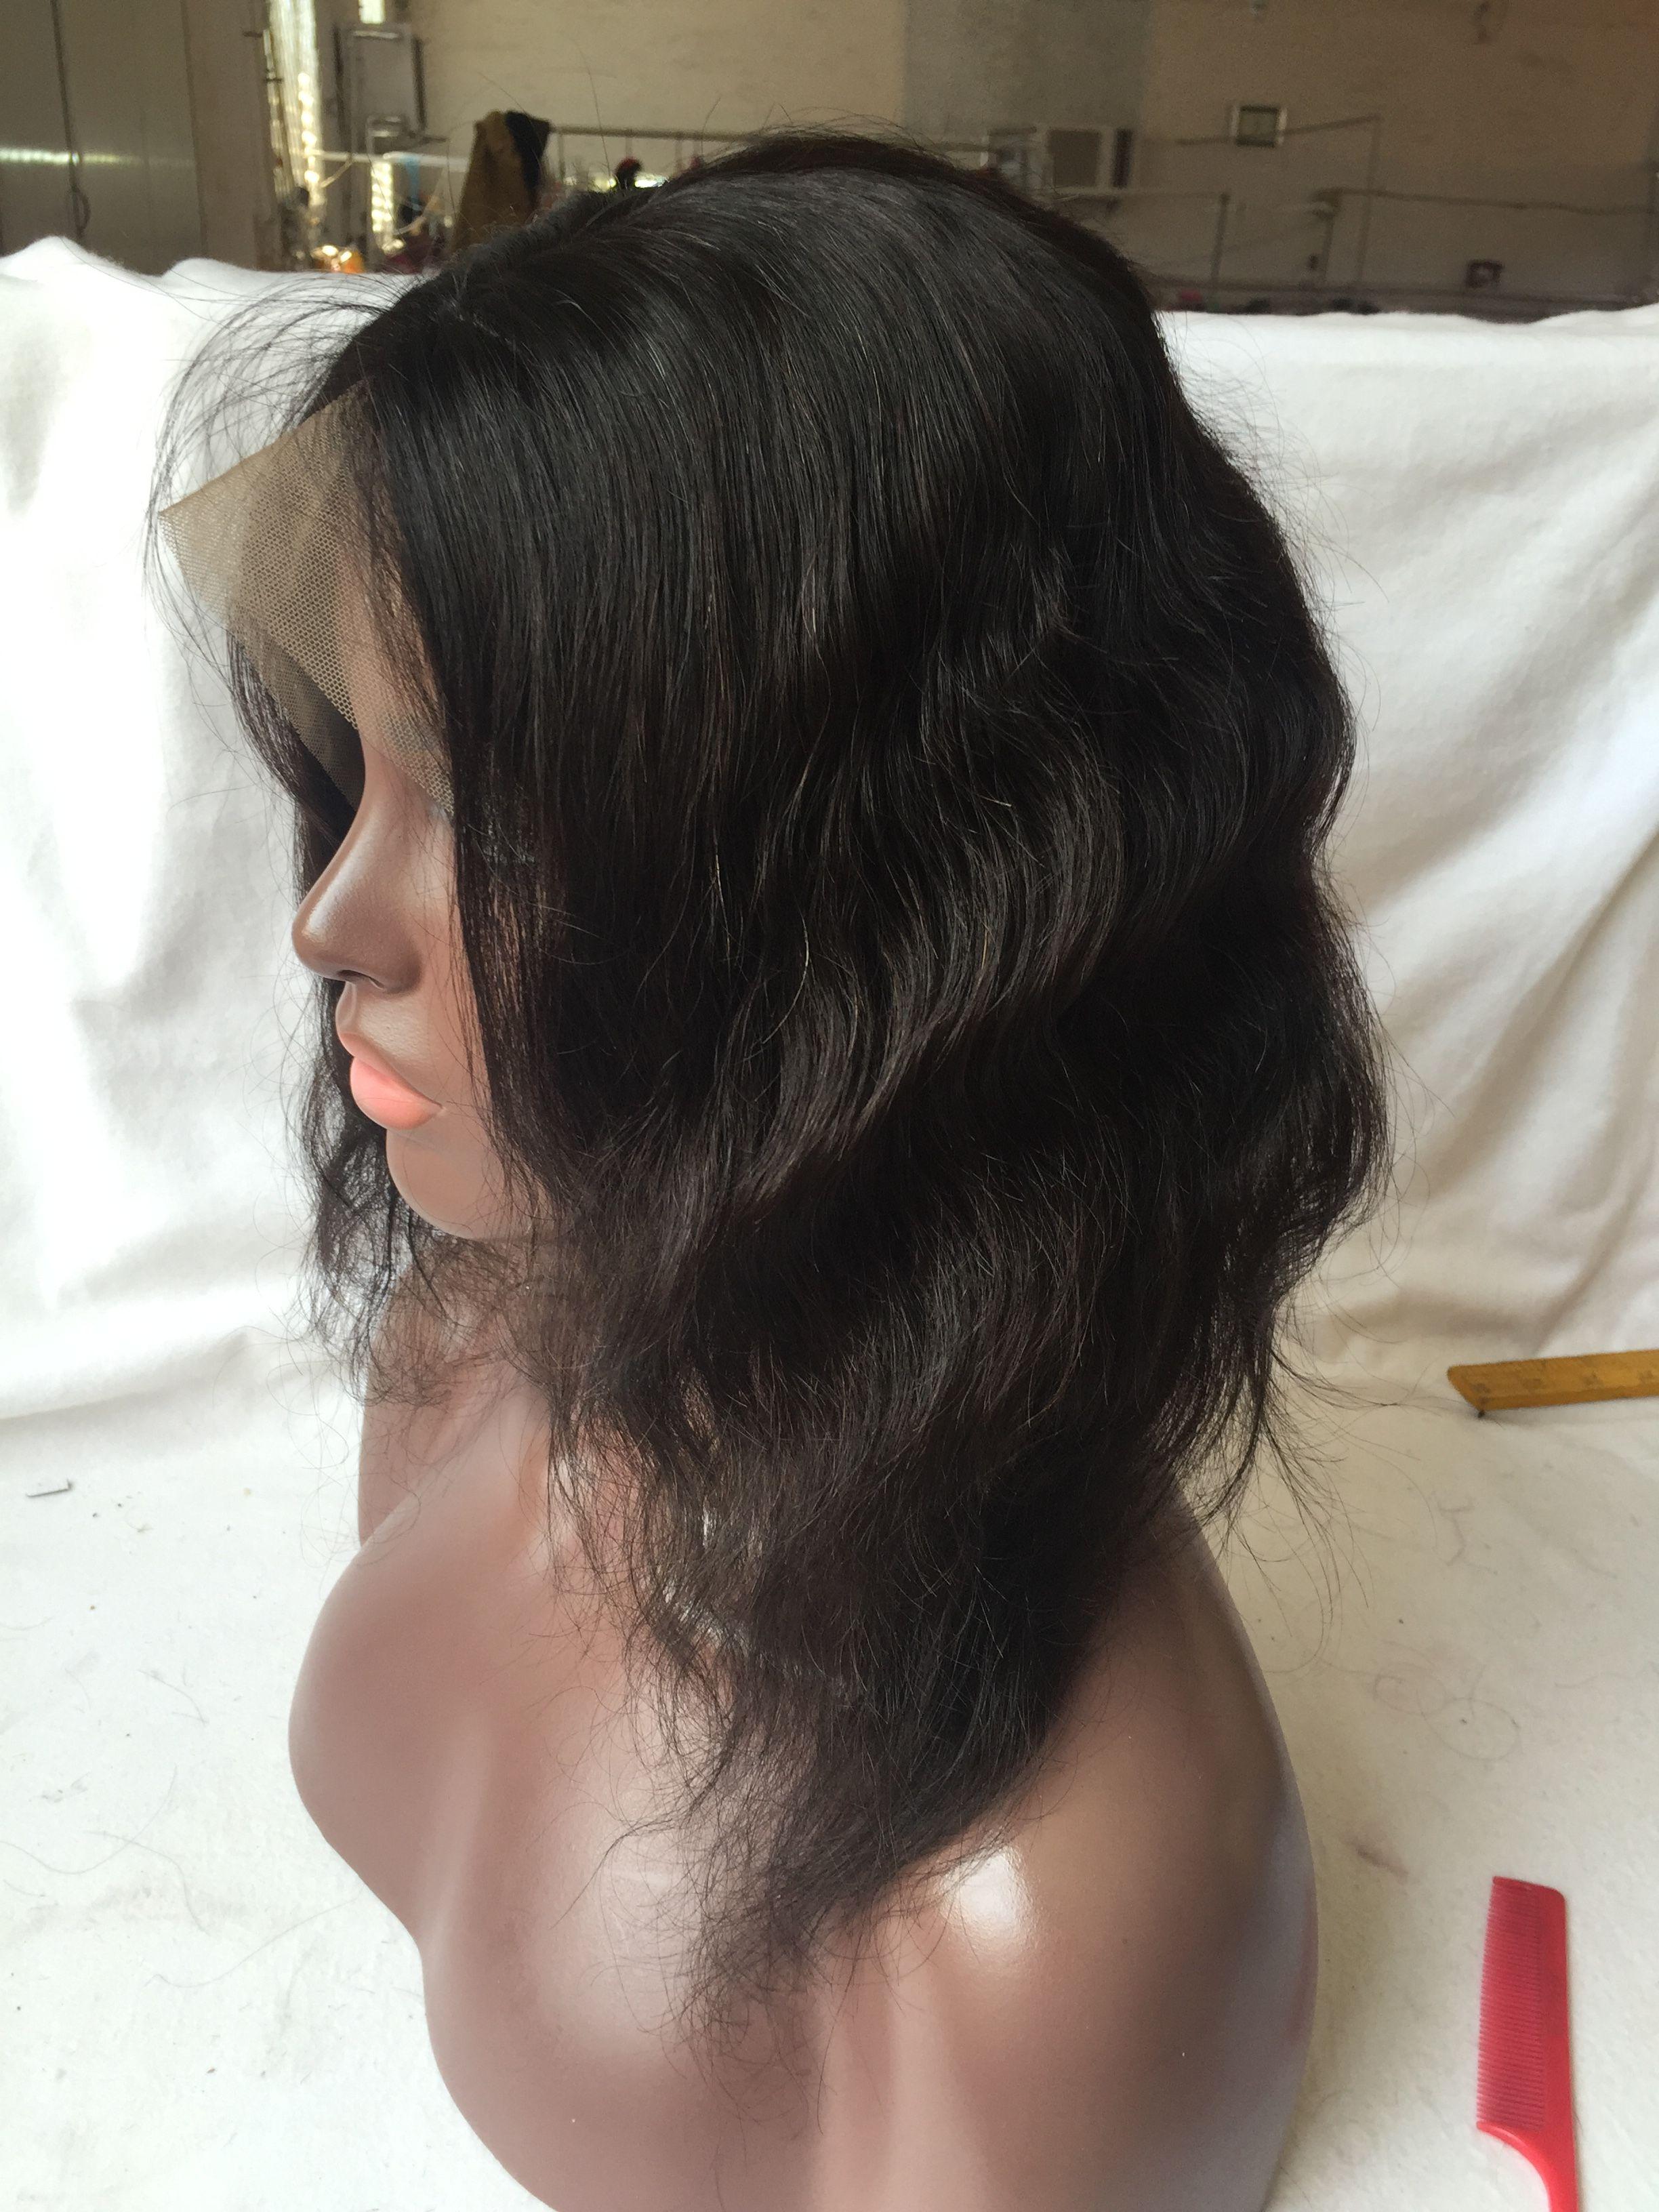 Natural wave brazilian virgin hair lace front wigs with bangs short bob wavy human hair full lace human hair wigs for black women